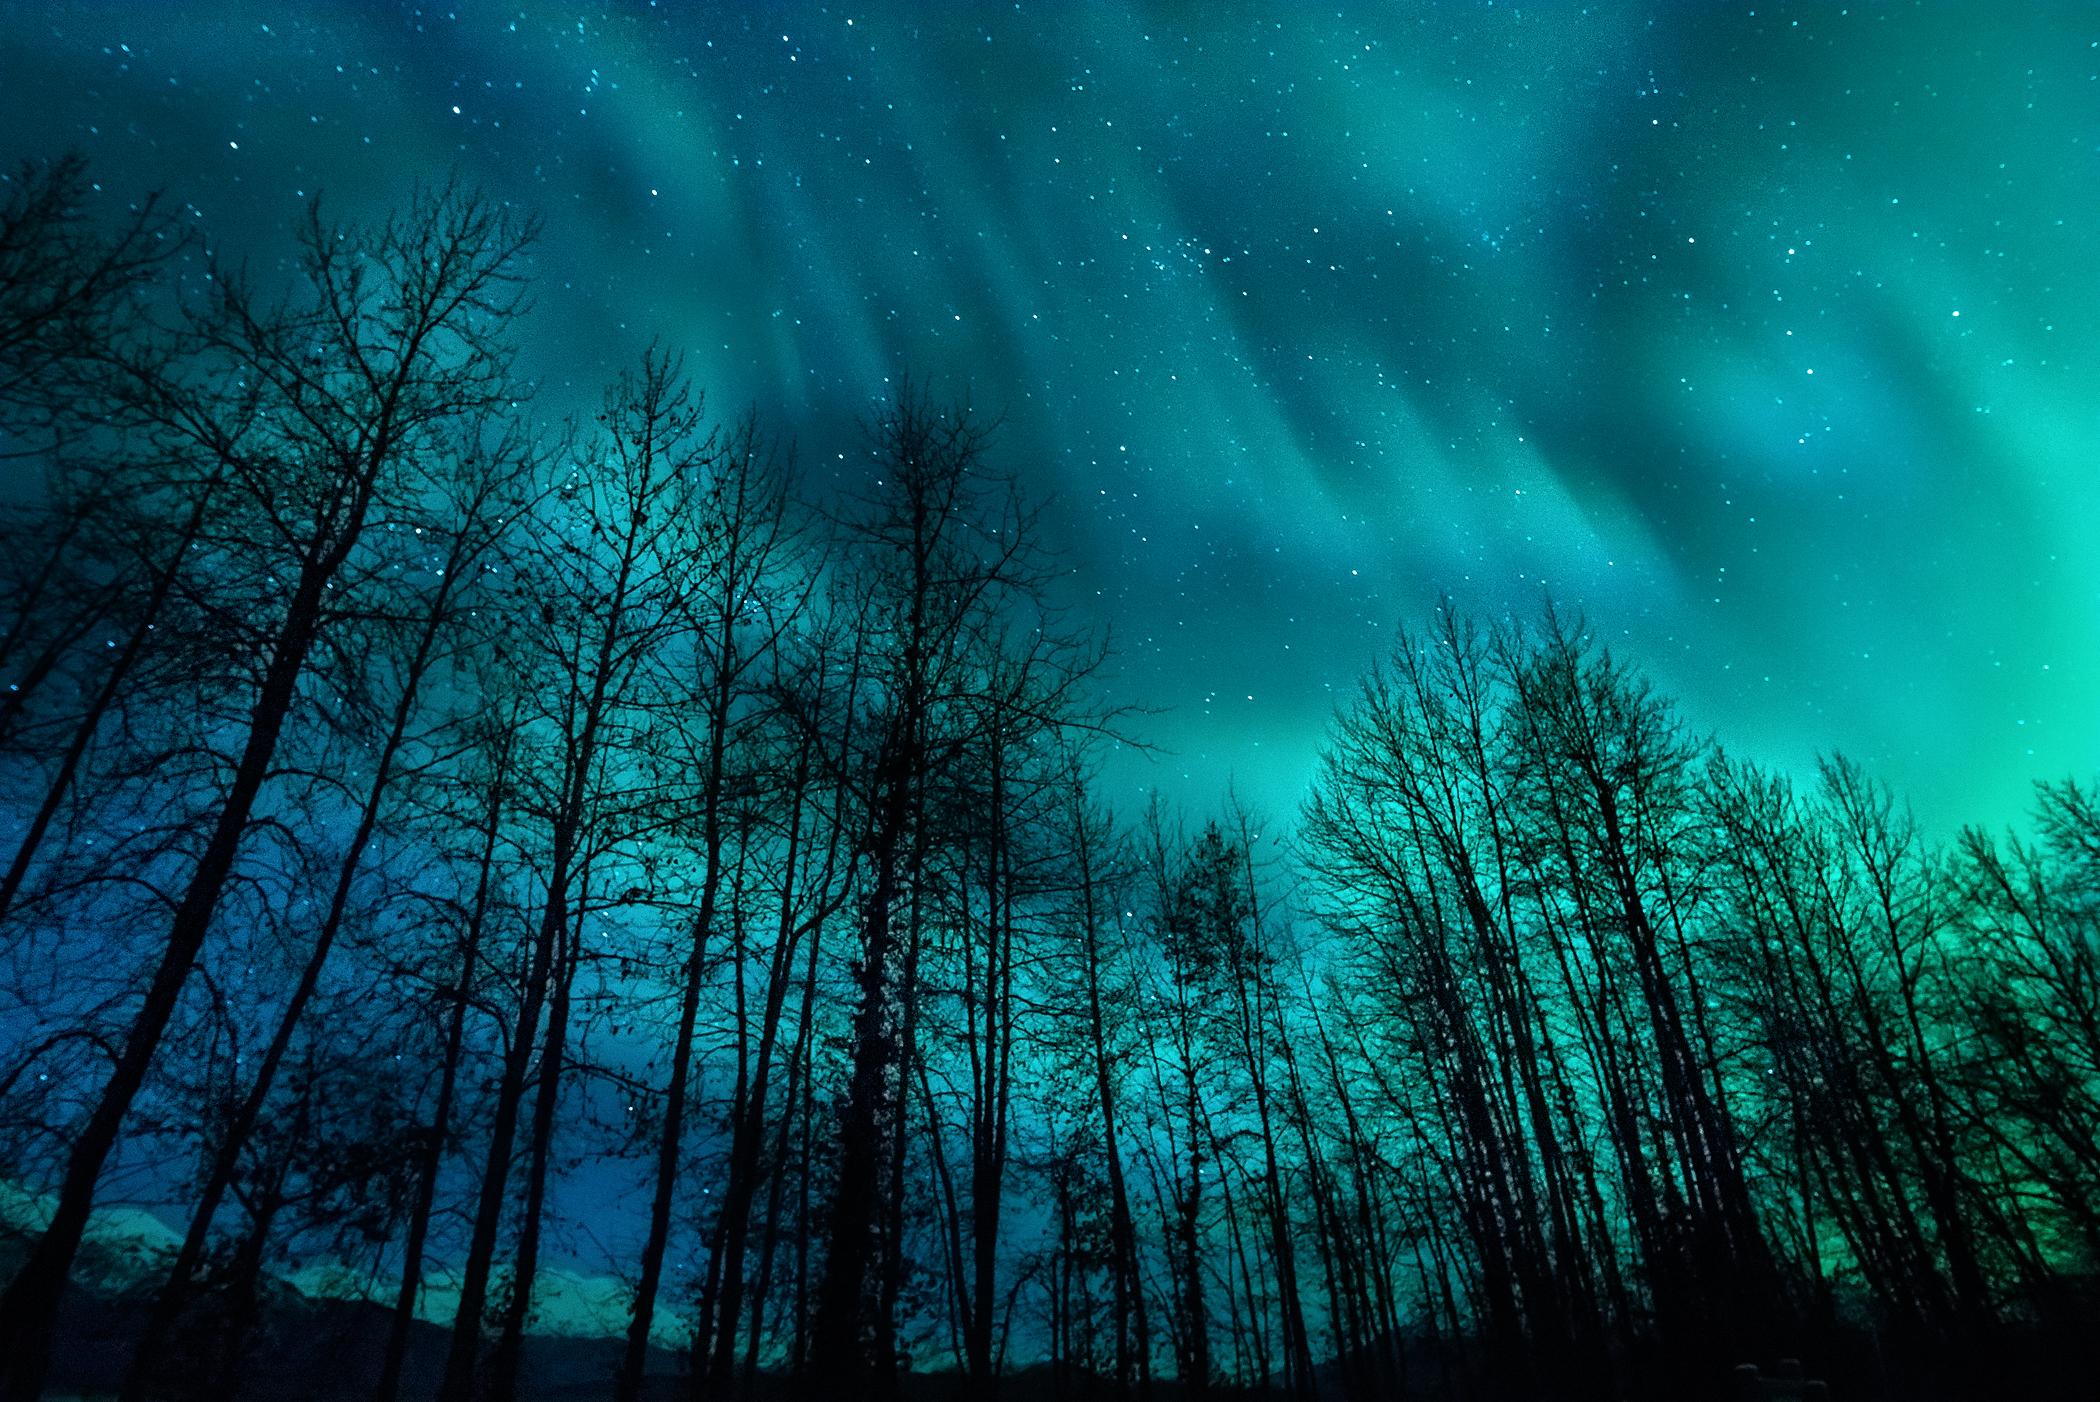 Aurora Borealis, Alaska ©2018 Brian Rivera Uncapher